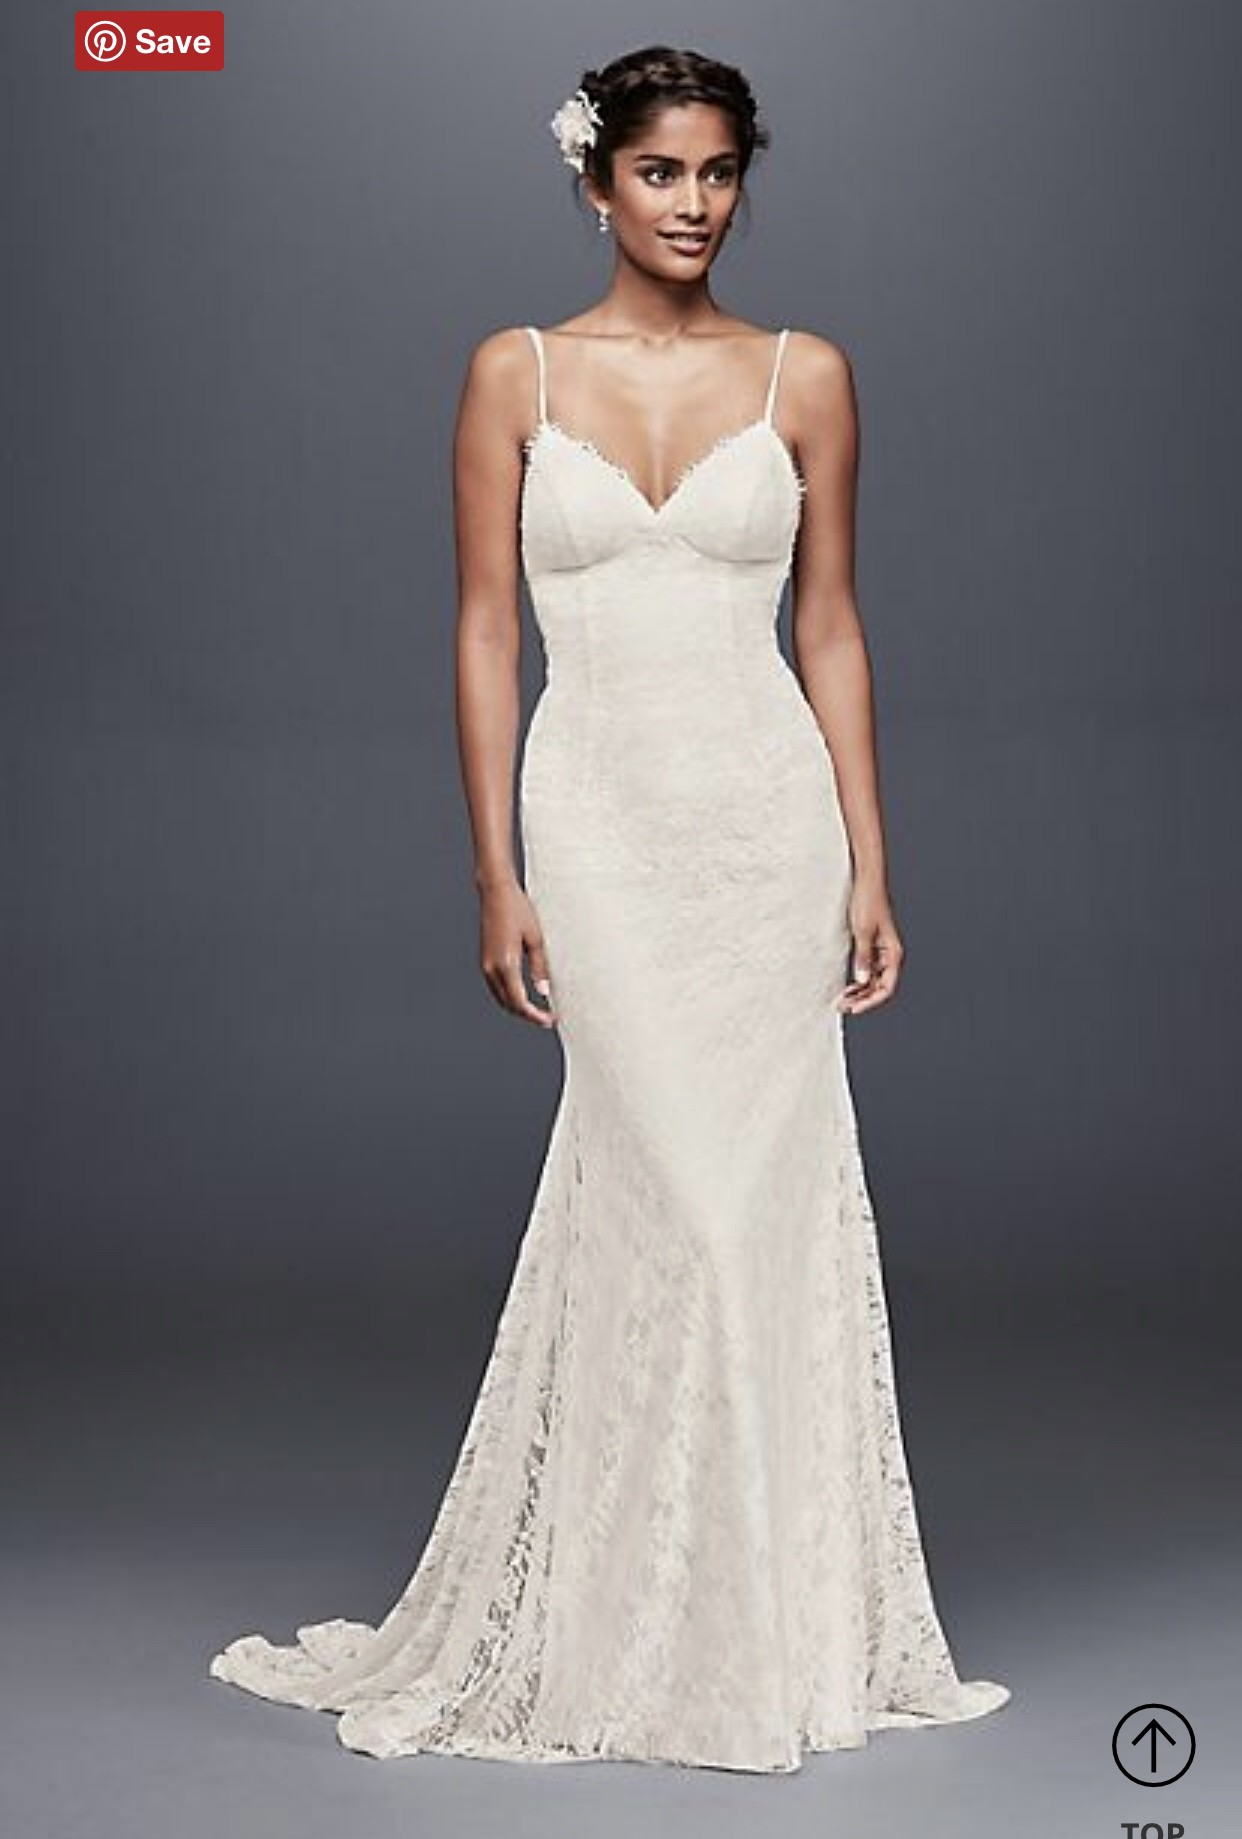 42503c8c37e Davids Bridal Wedding Dresses Images - Gomes Weine AG